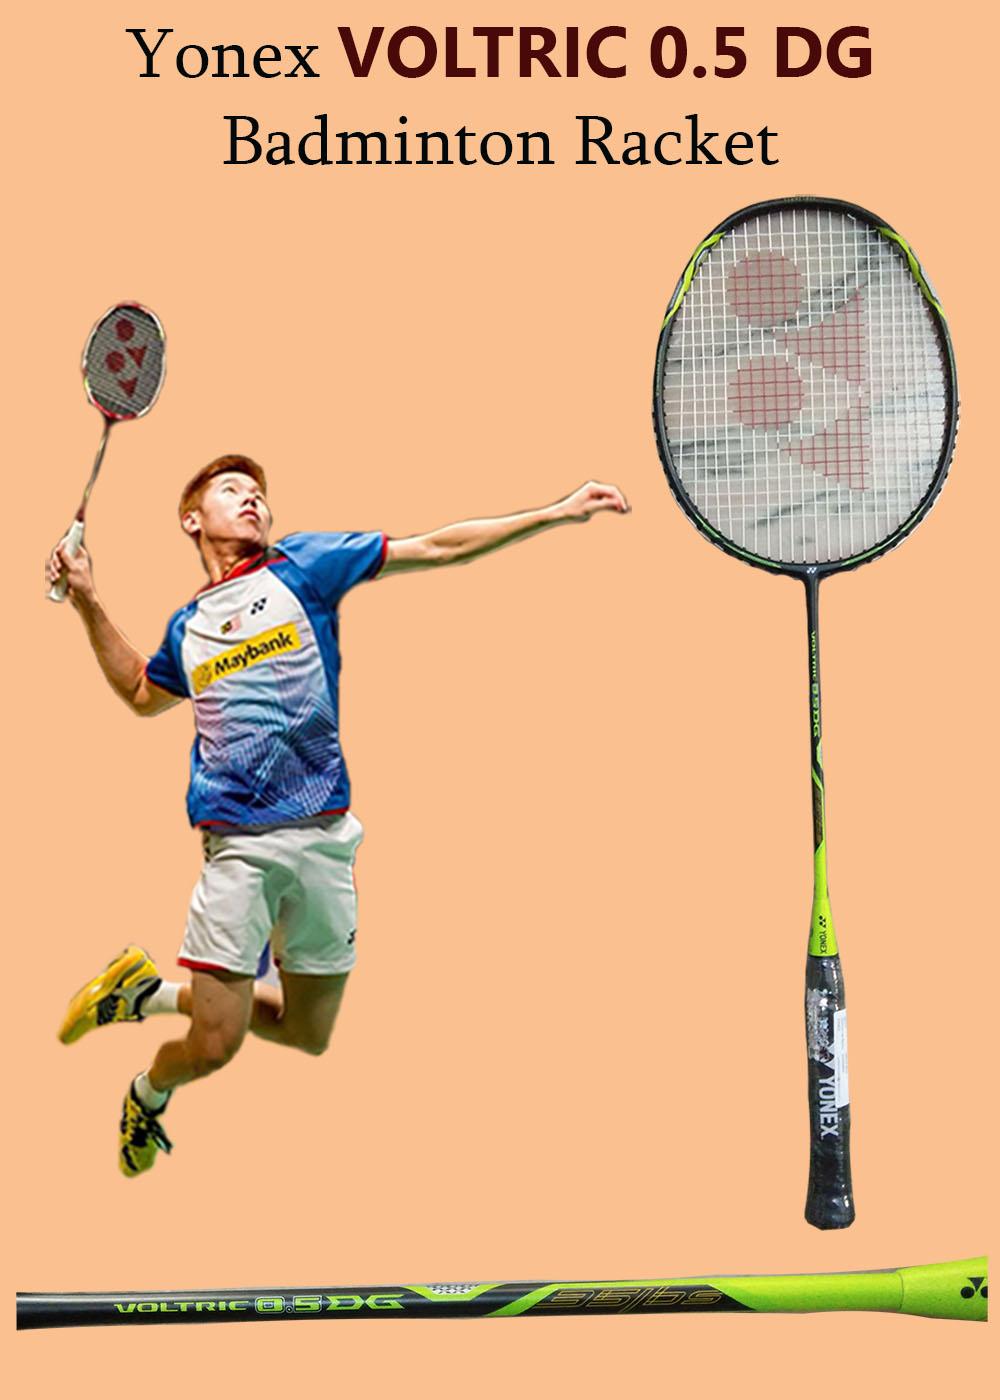 YONEX VOLTRIC 05 DG Badminton Racket